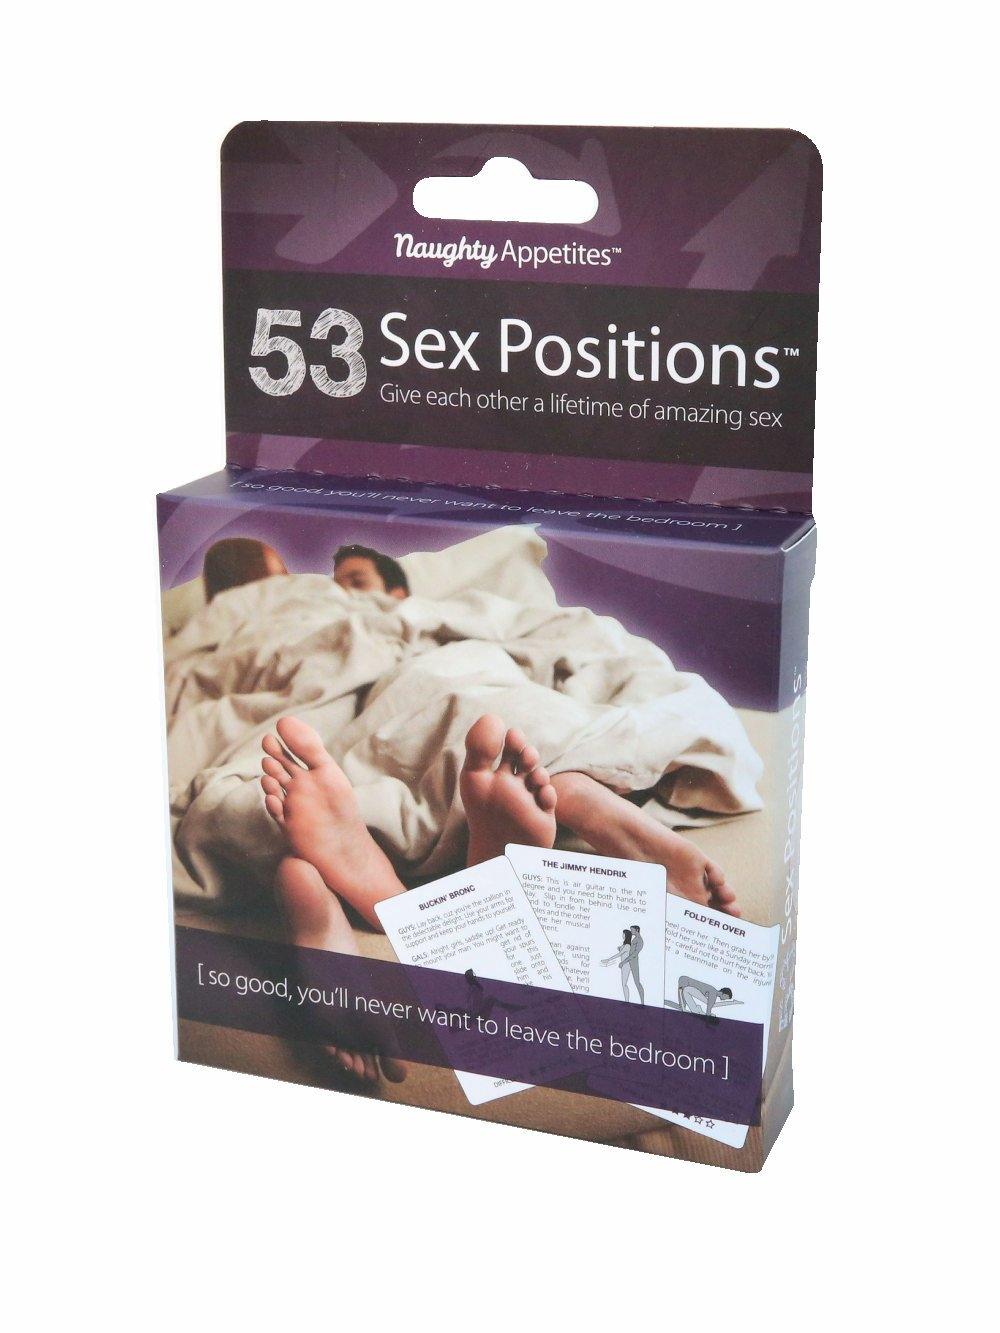 Eros sex position